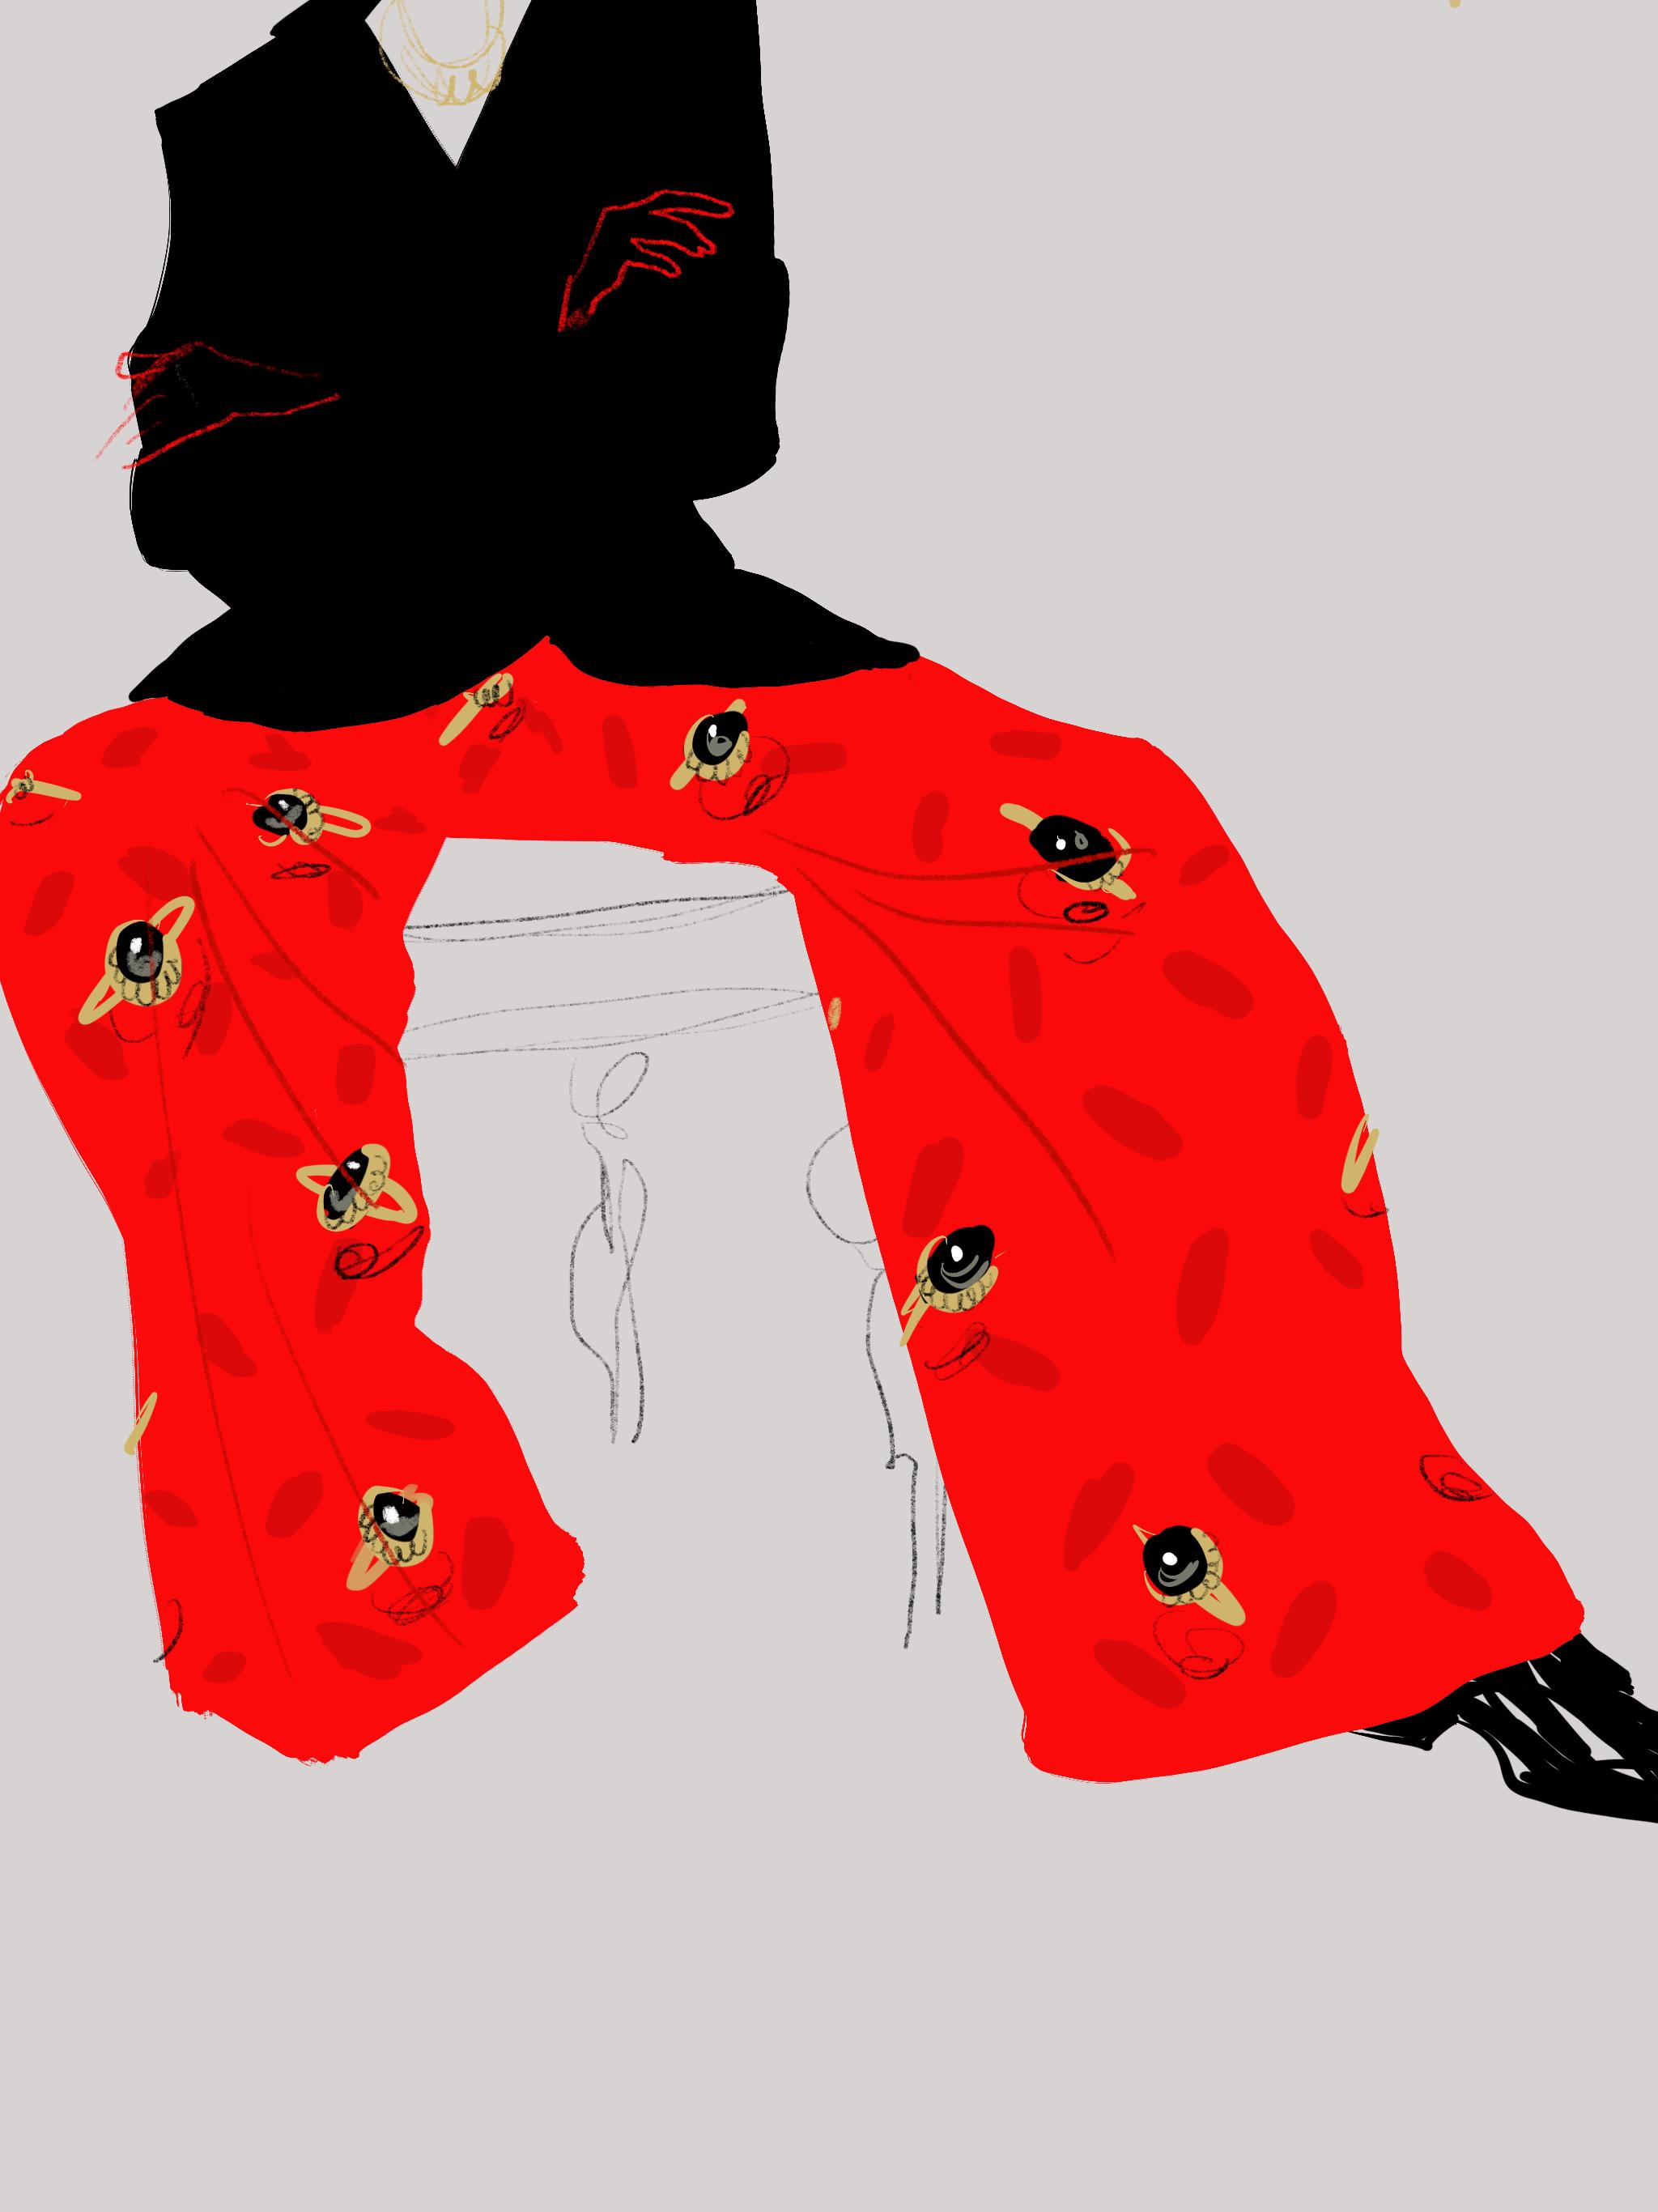 Fashion Illustration - Open Toe Illustration